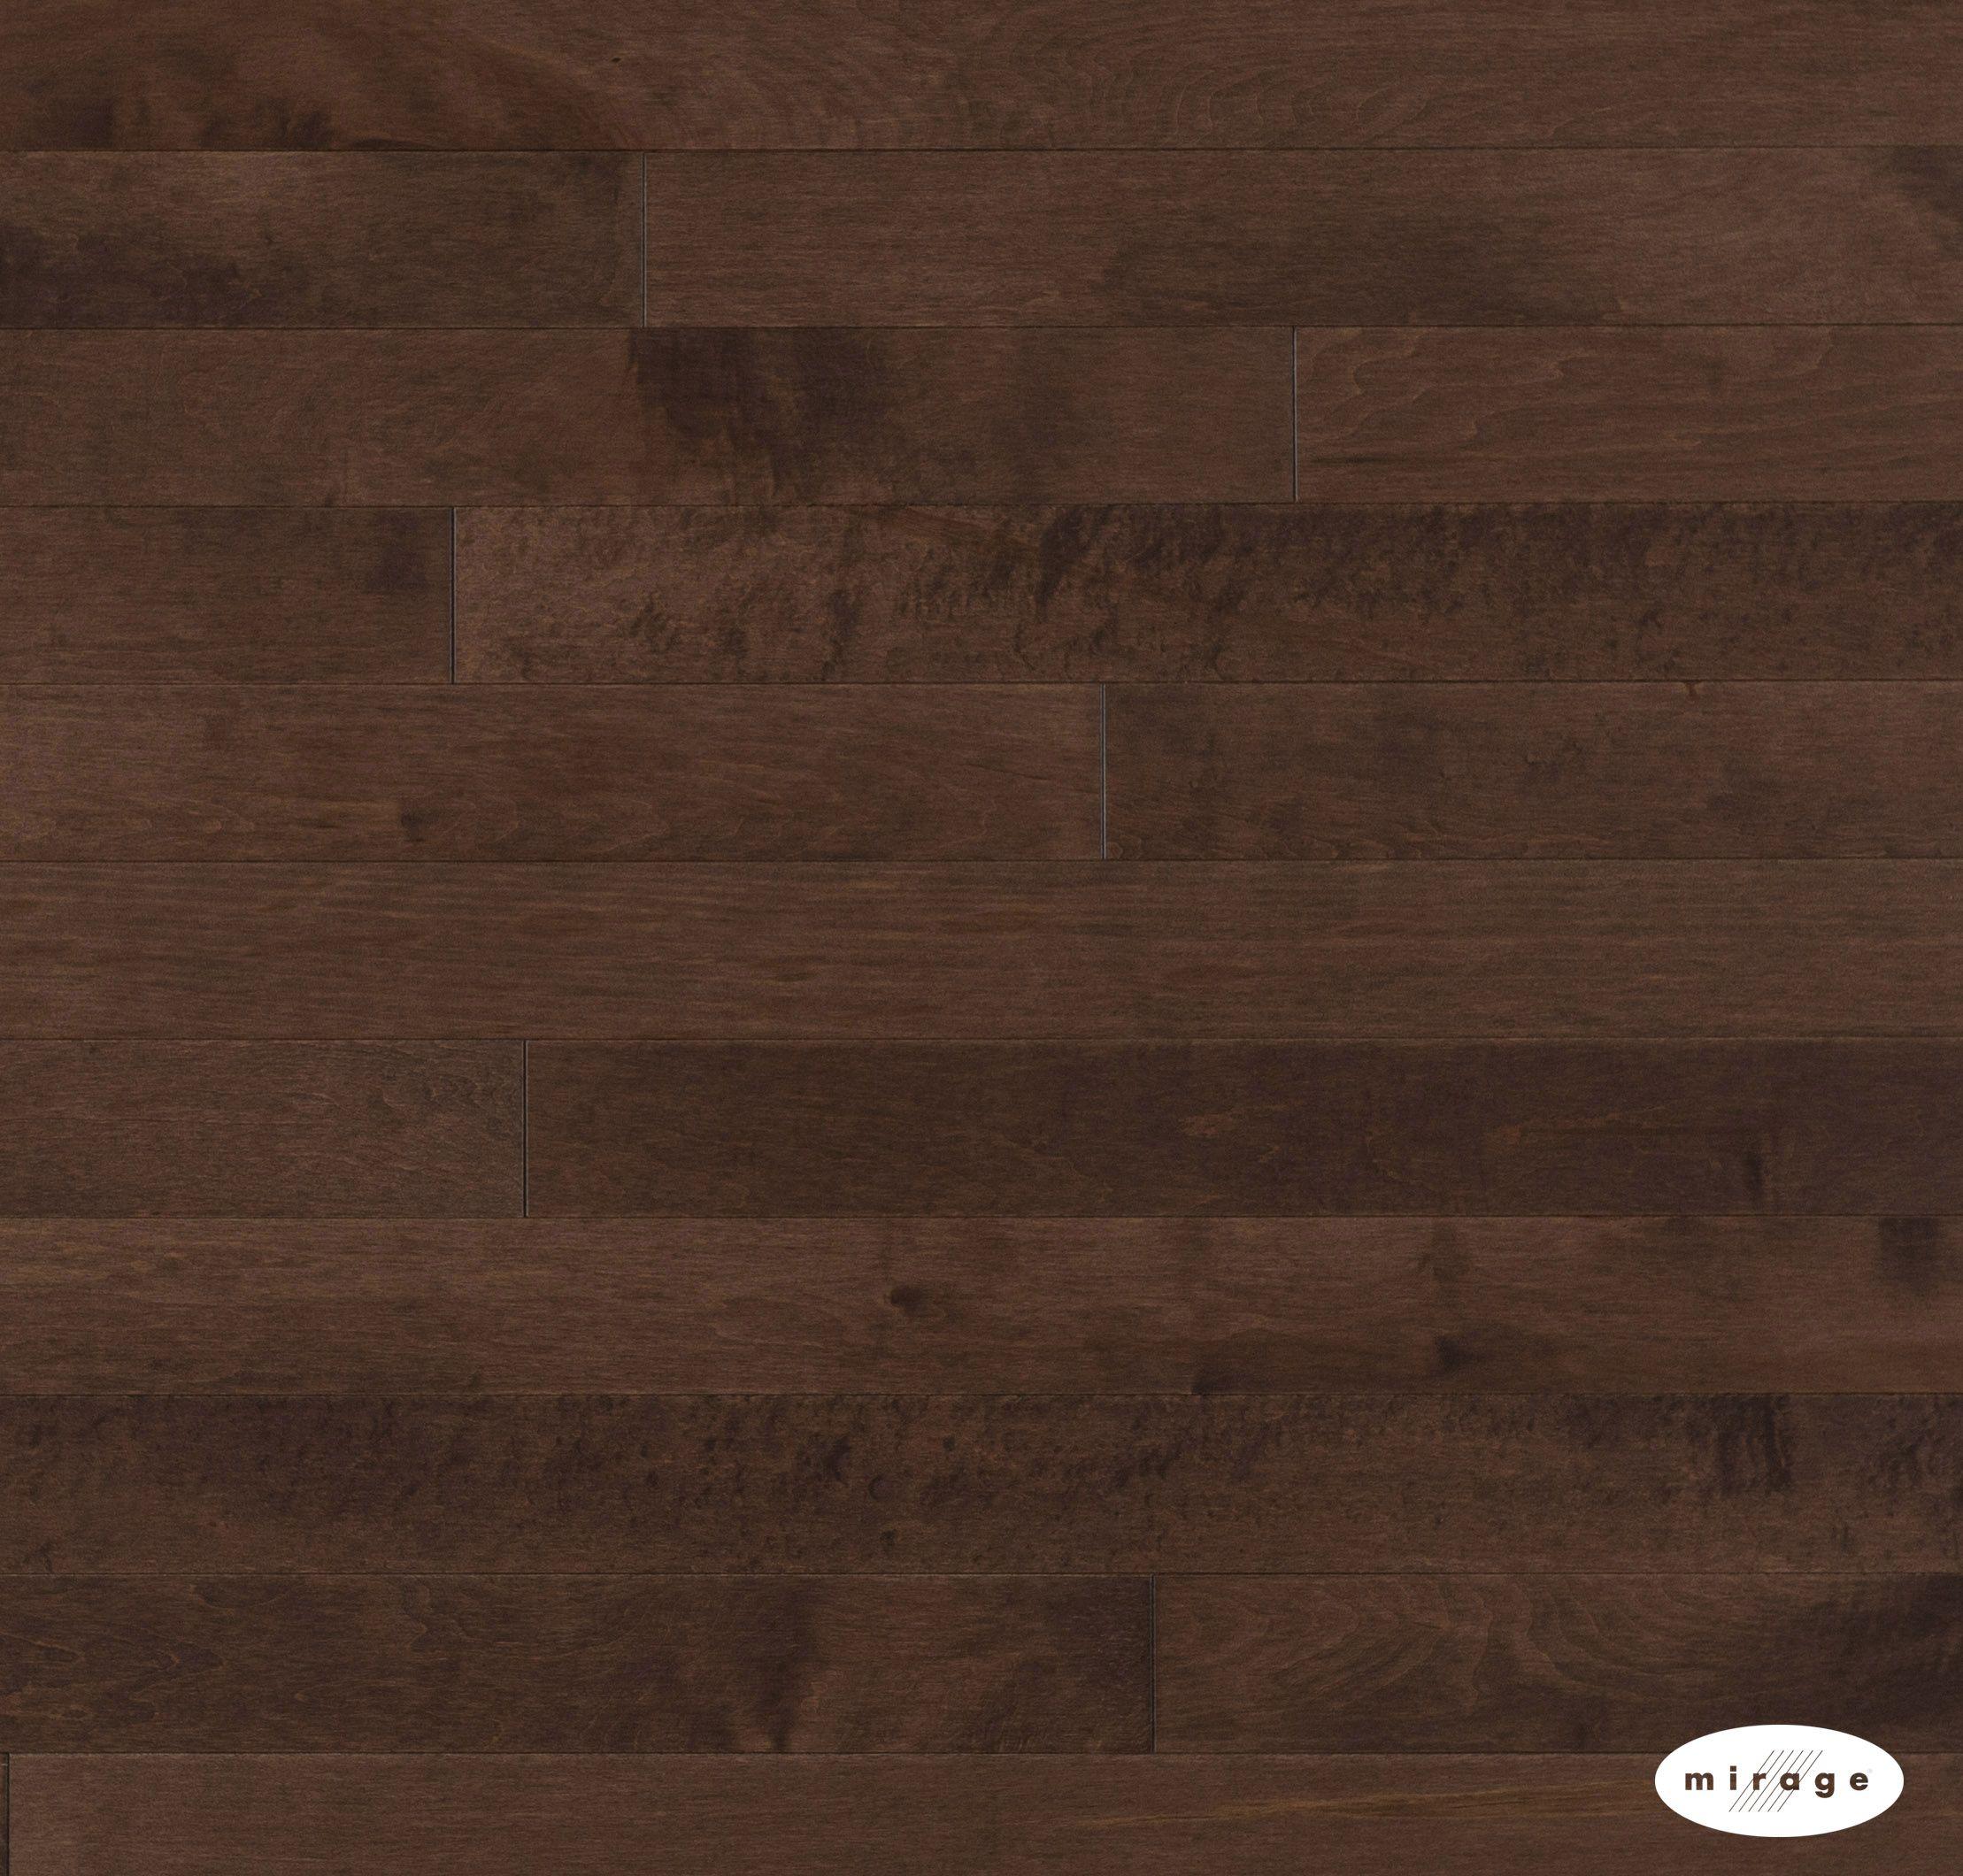 Mirage Floors Maple Bolton Flooring